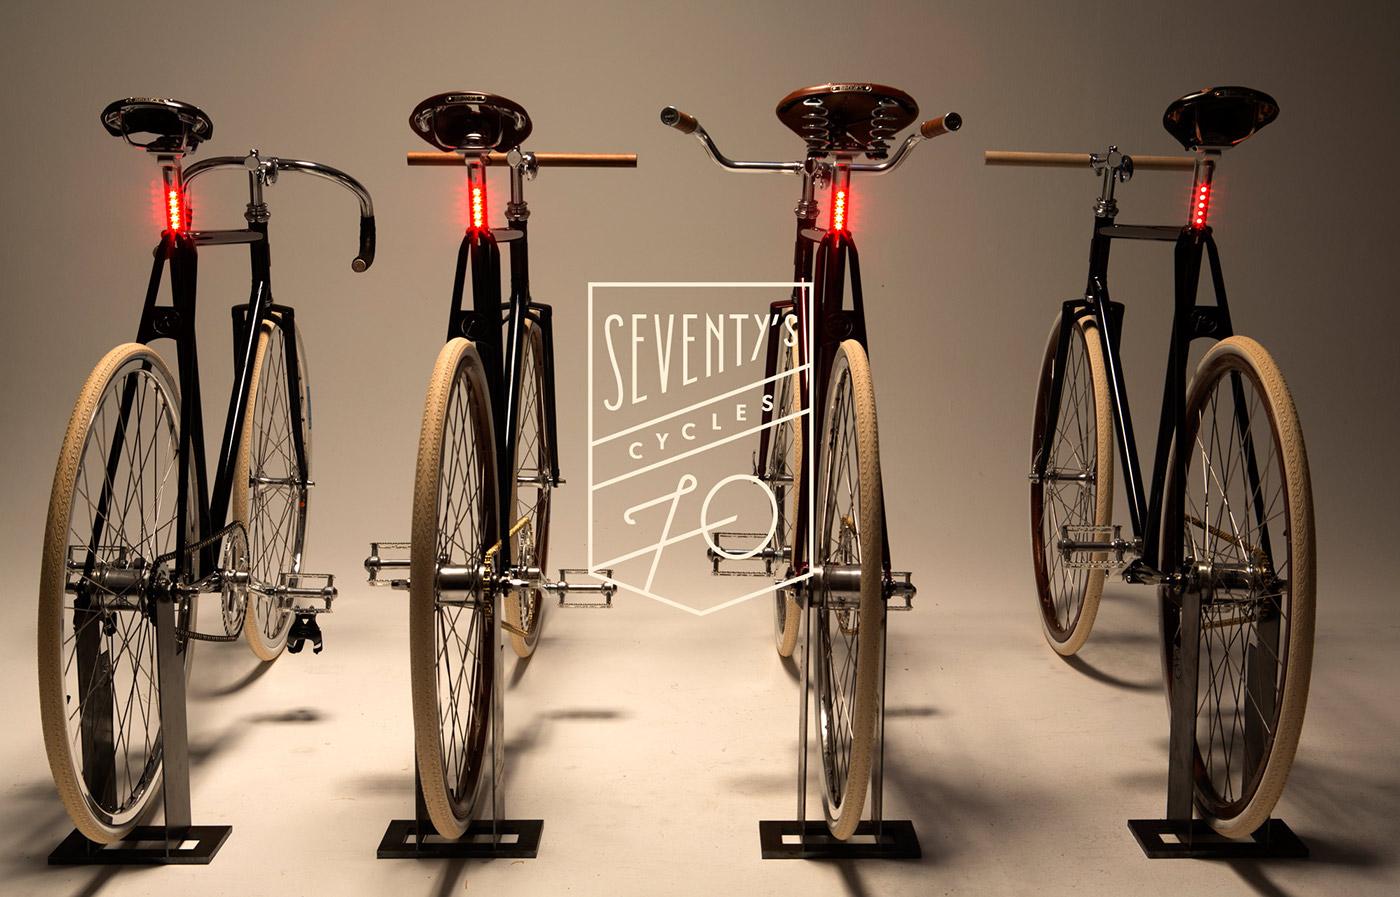 SEVENTYS CYCLES